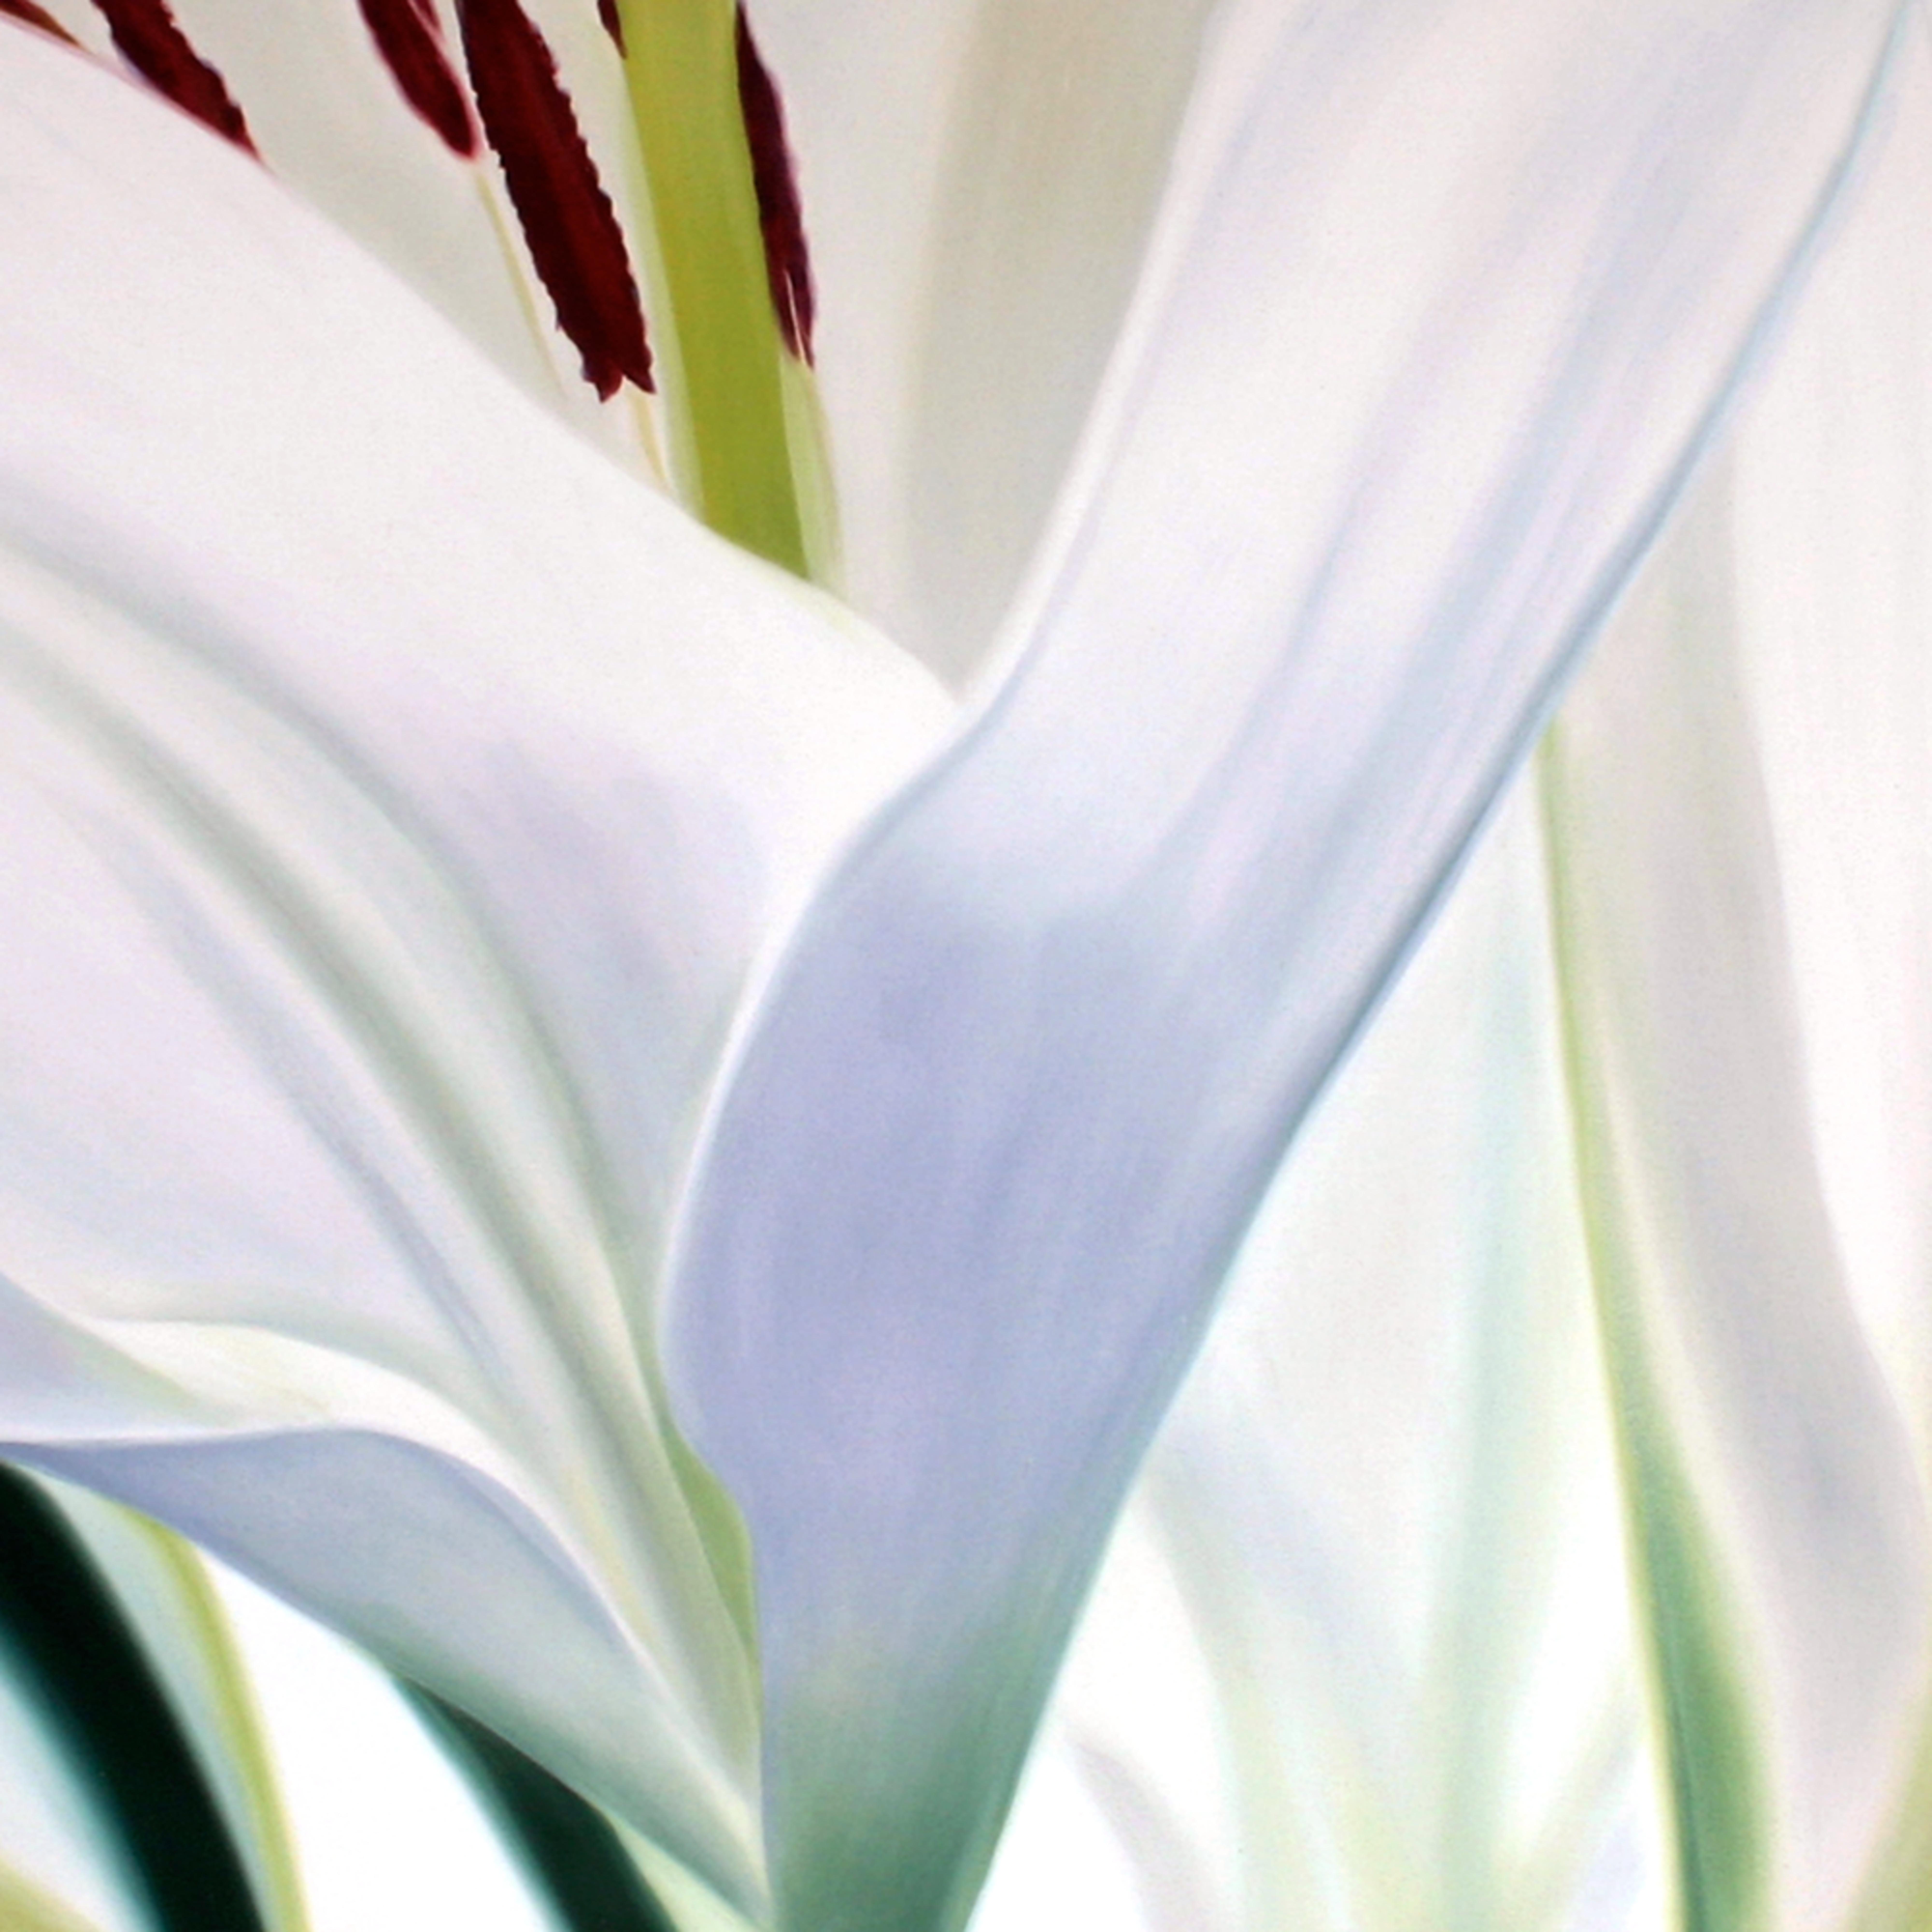 lilies ysrp7v